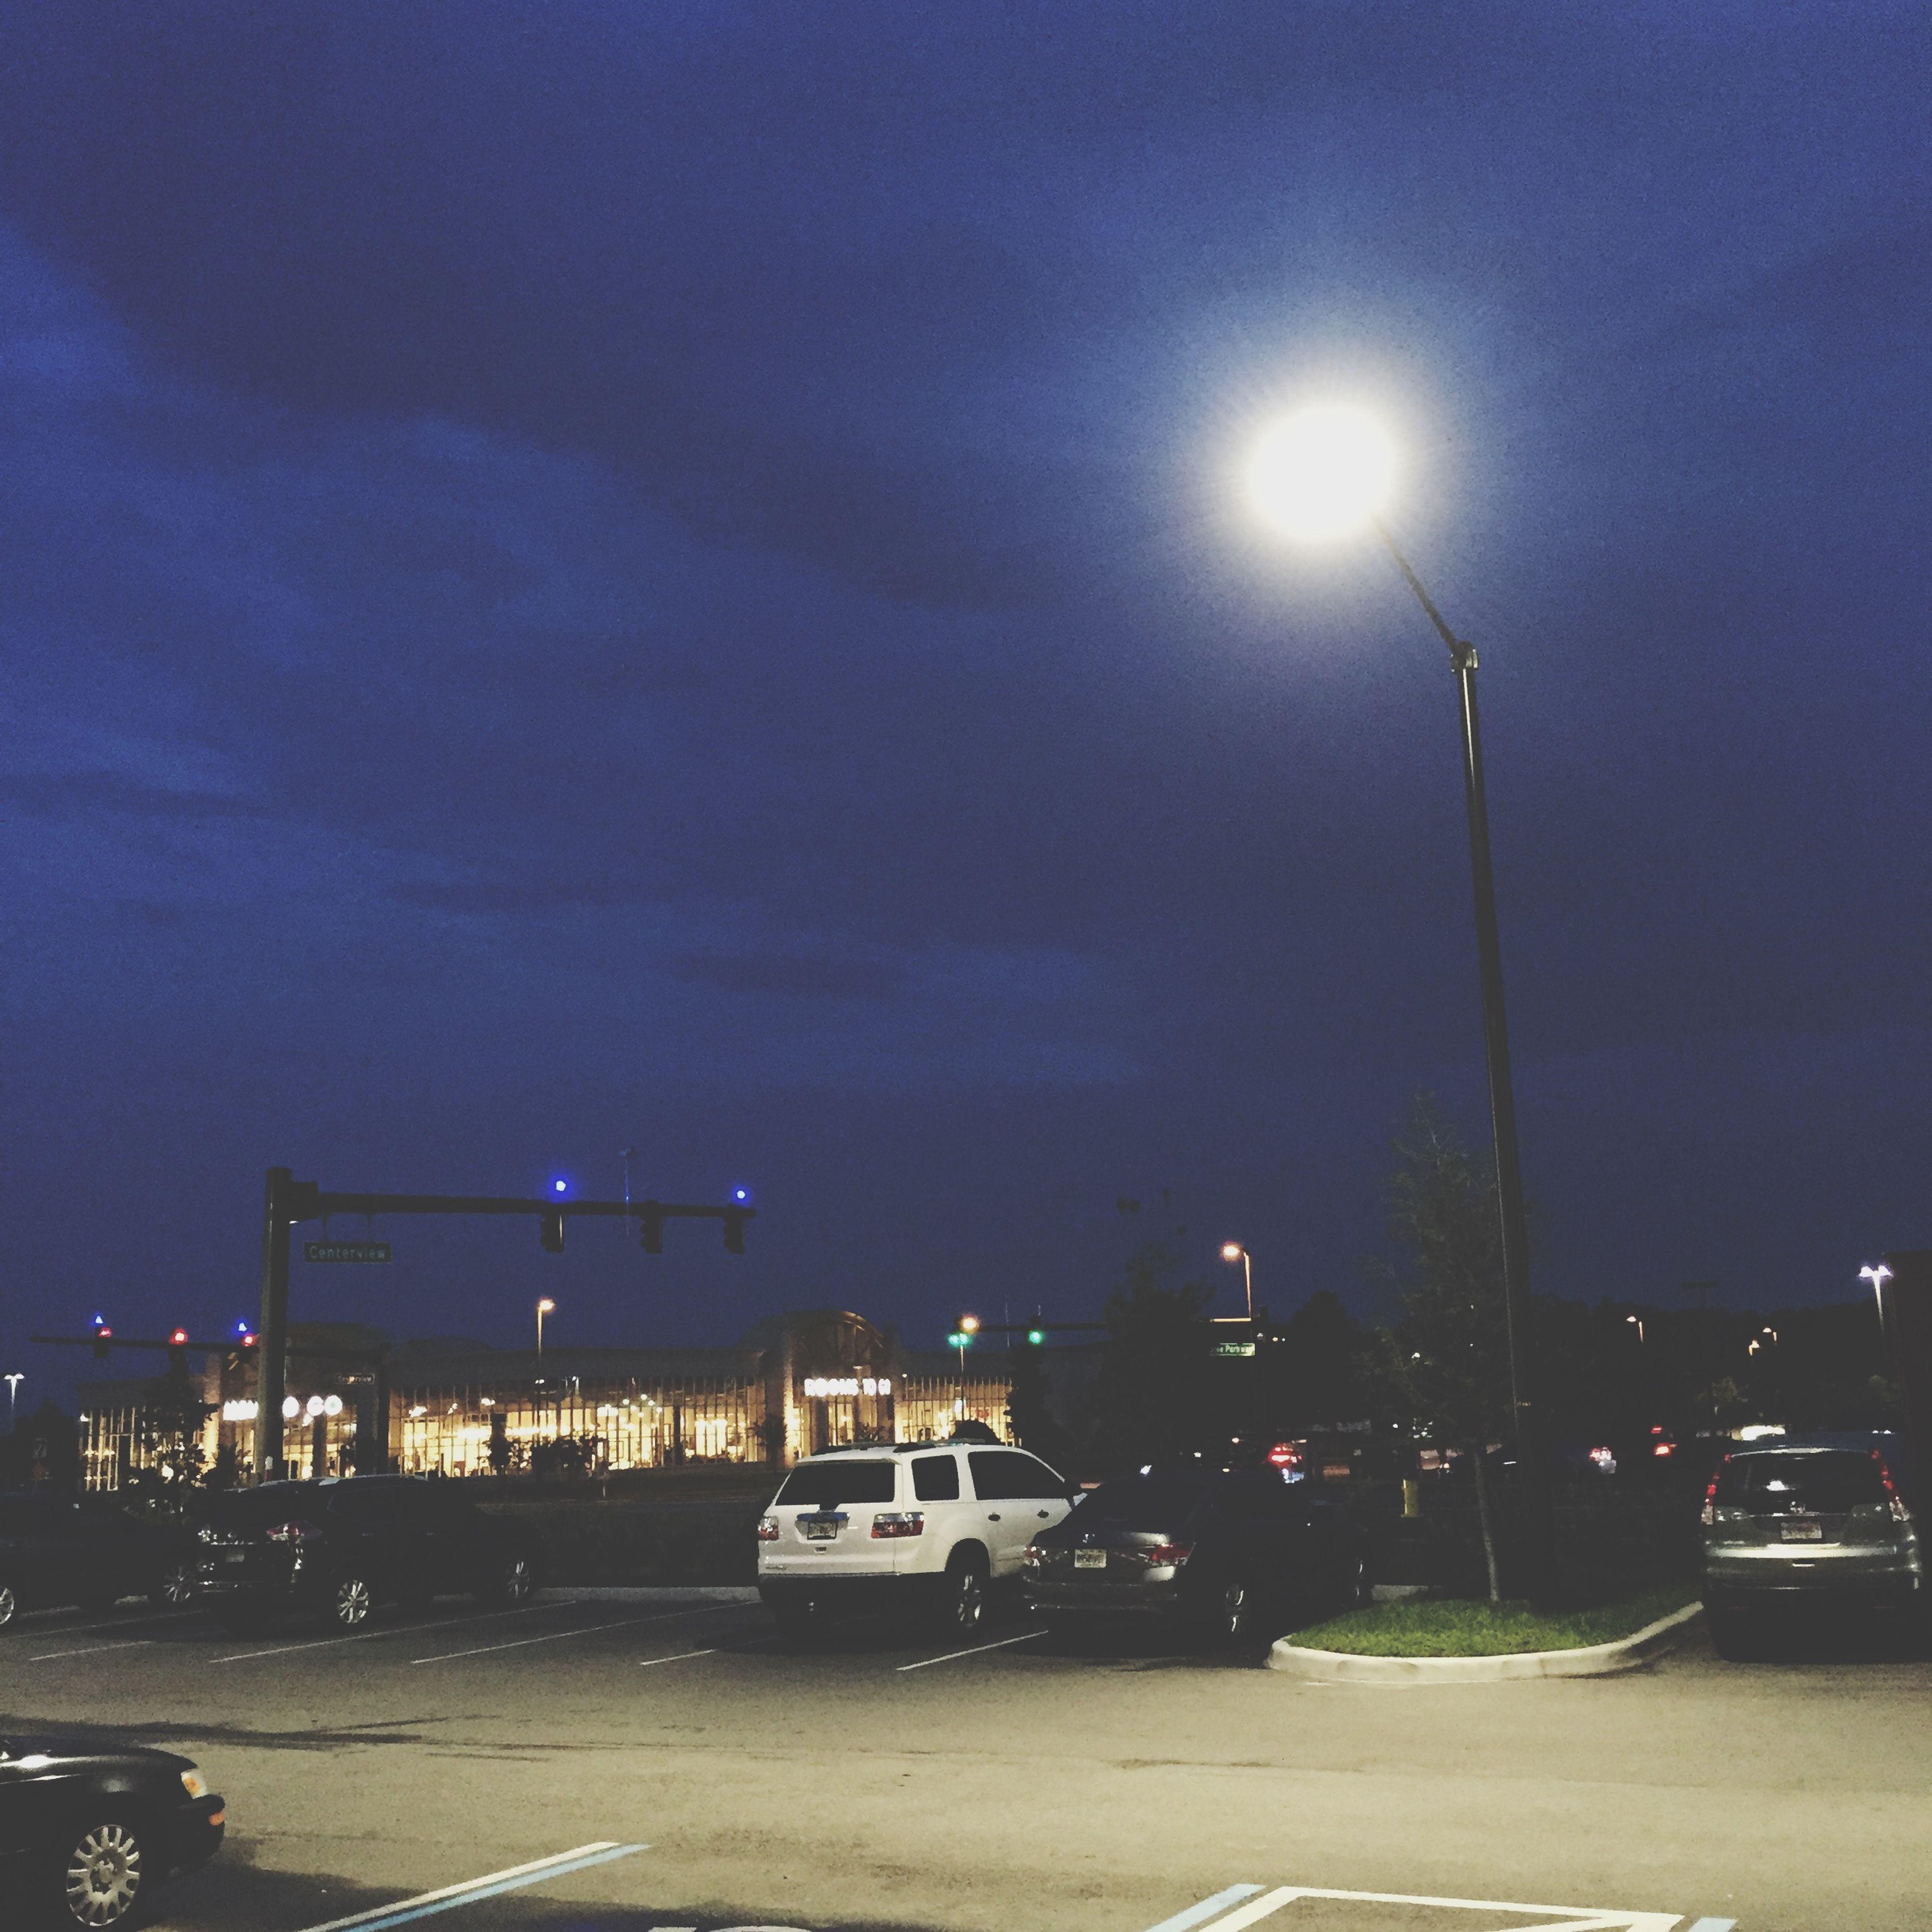 street light, illuminated, night, sky, transportation, car, street, land vehicle, building exterior, lighting equipment, road, mode of transport, built structure, architecture, cloud - sky, city, dusk, weather, outdoors, city street